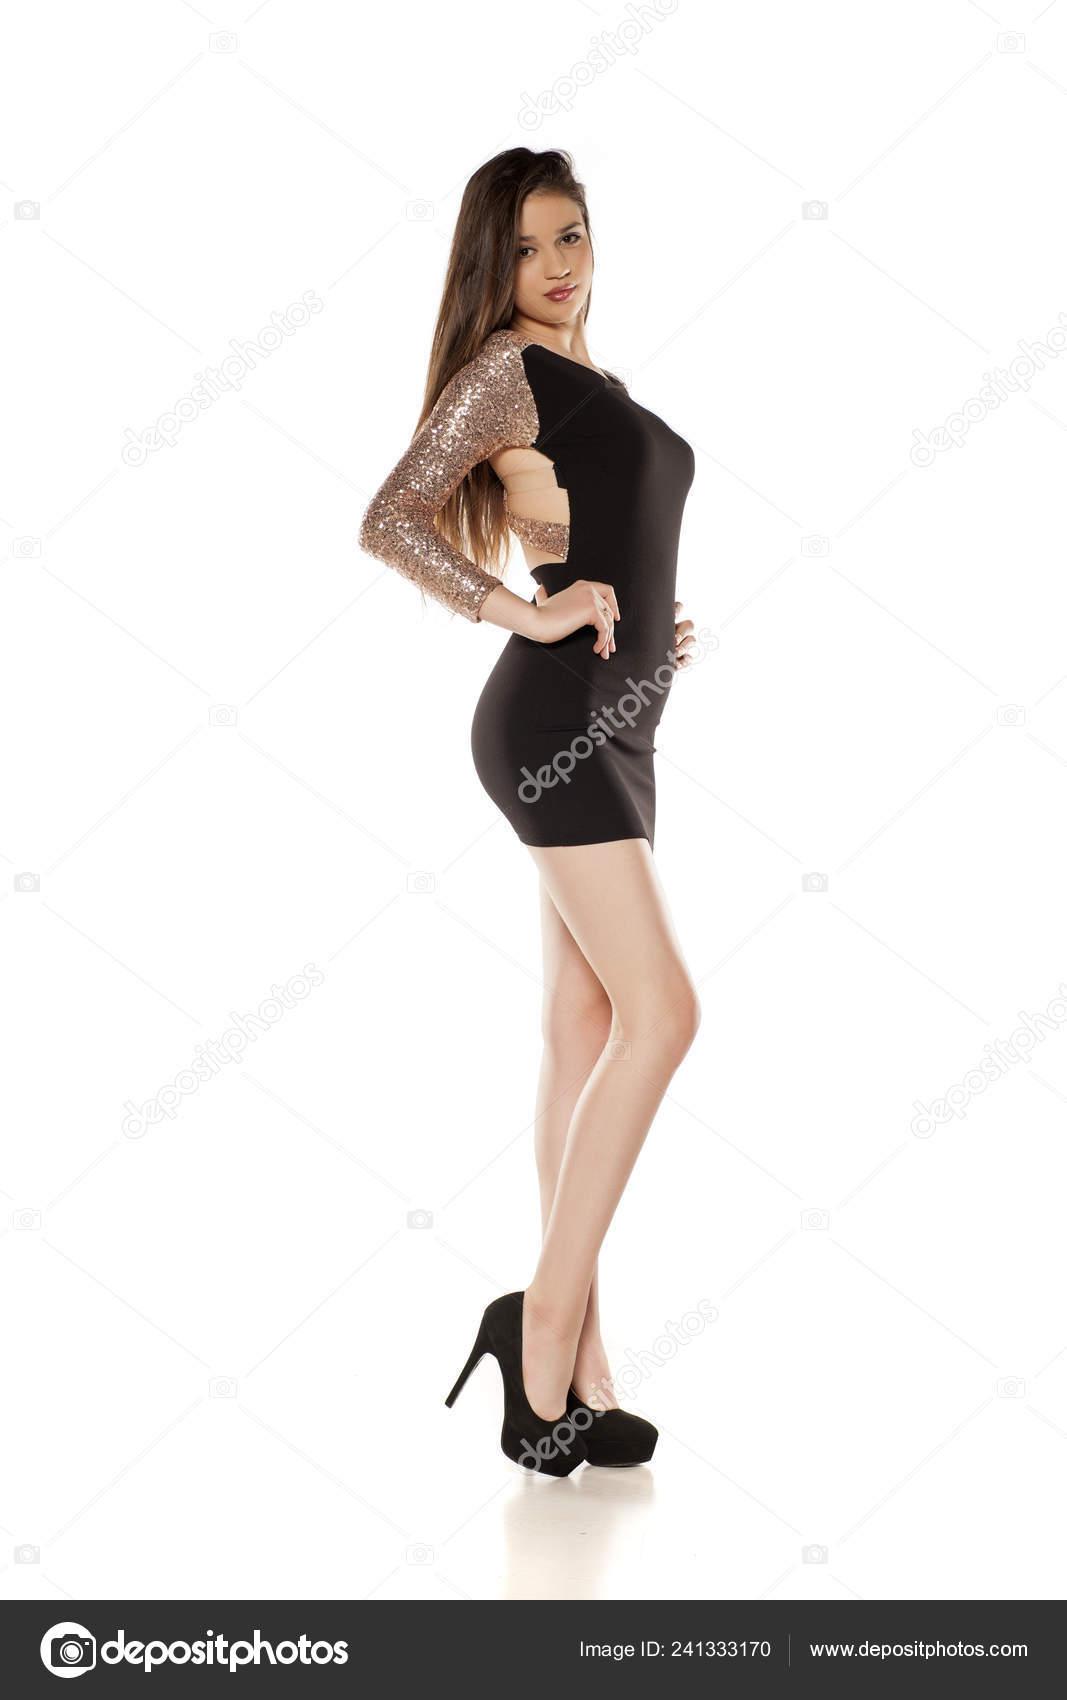 Young Girl Tight Black Dress High Heels